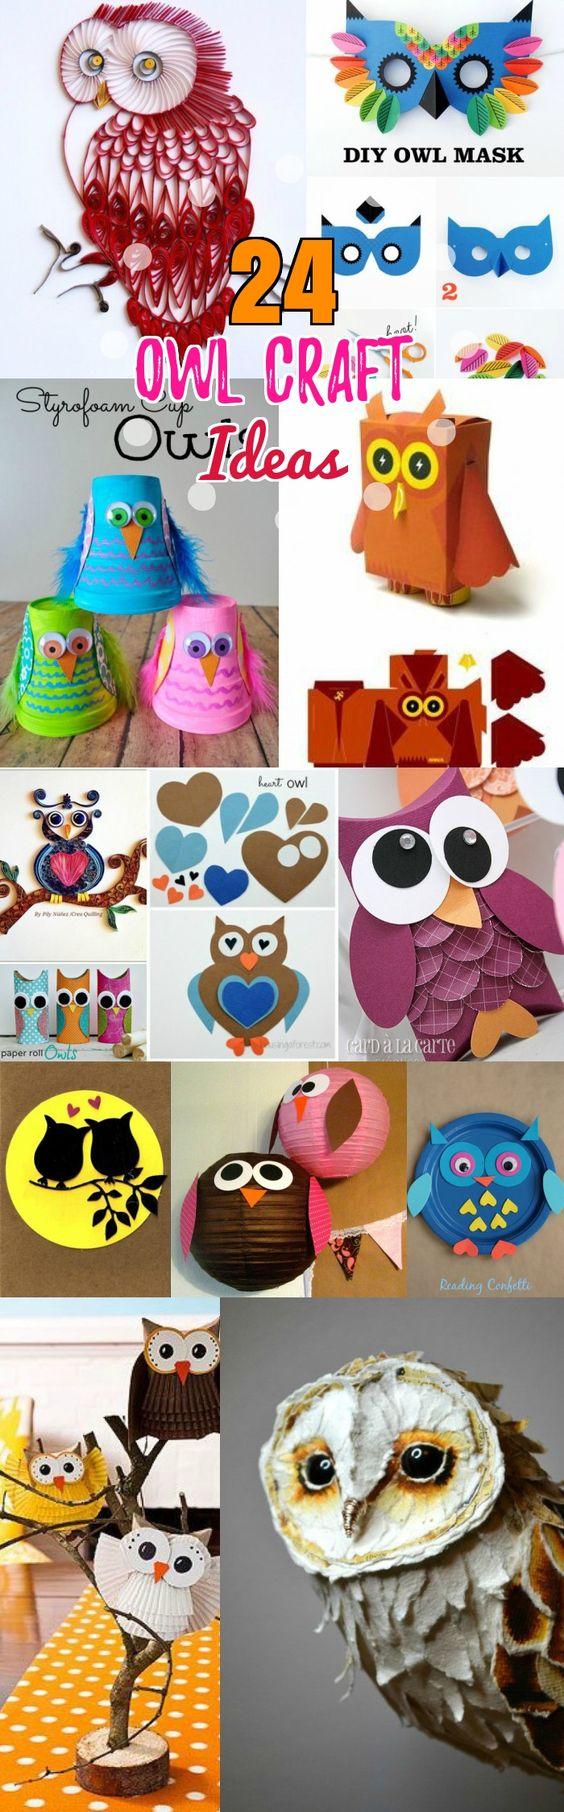 Diy birds craft 24 easy paper owl craft ideas for kids diy animal owl diy birds craft solutioingenieria Images